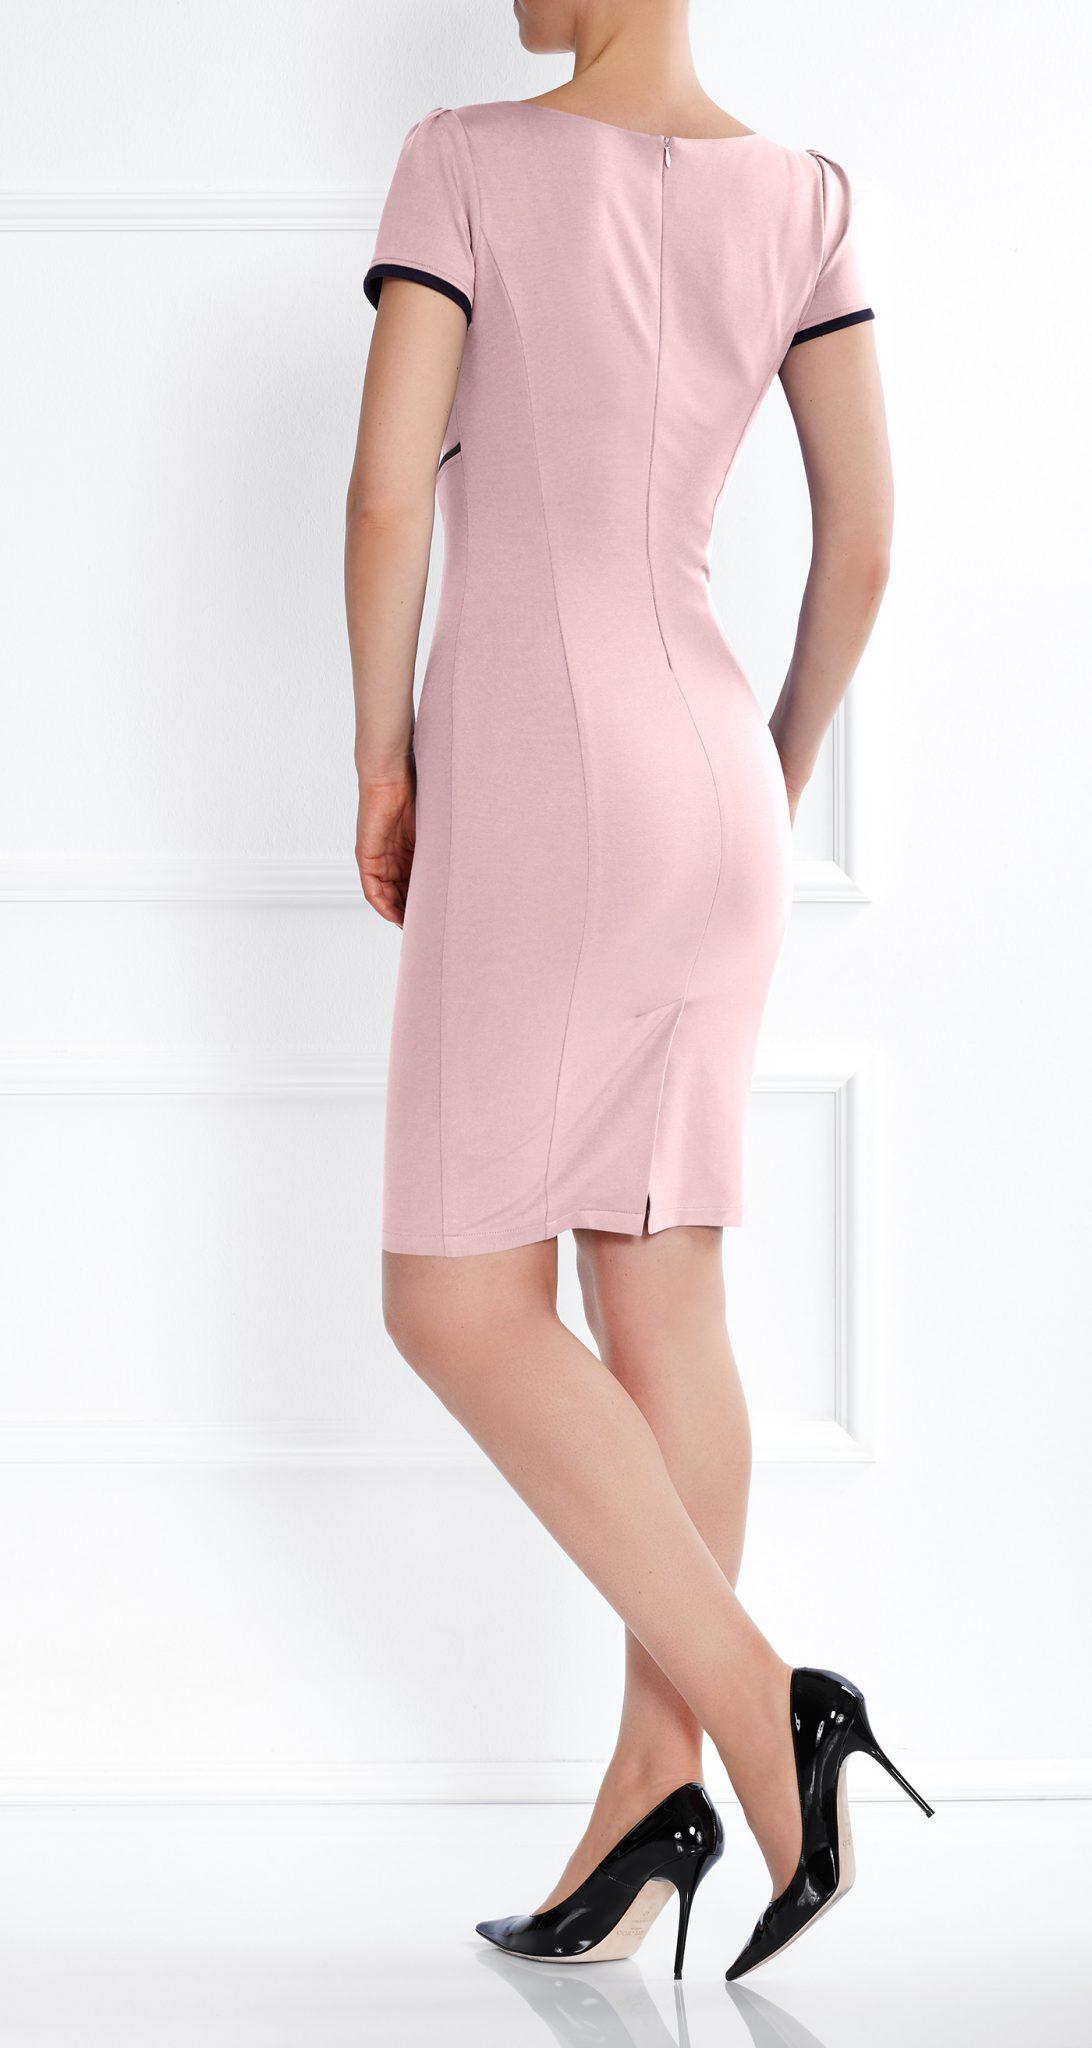 AMCO Fashion by Annett Möller | AMCO DAHLIA DRESS | ROSE | Rosa | Stretch Kleid mit markanter Linienführung